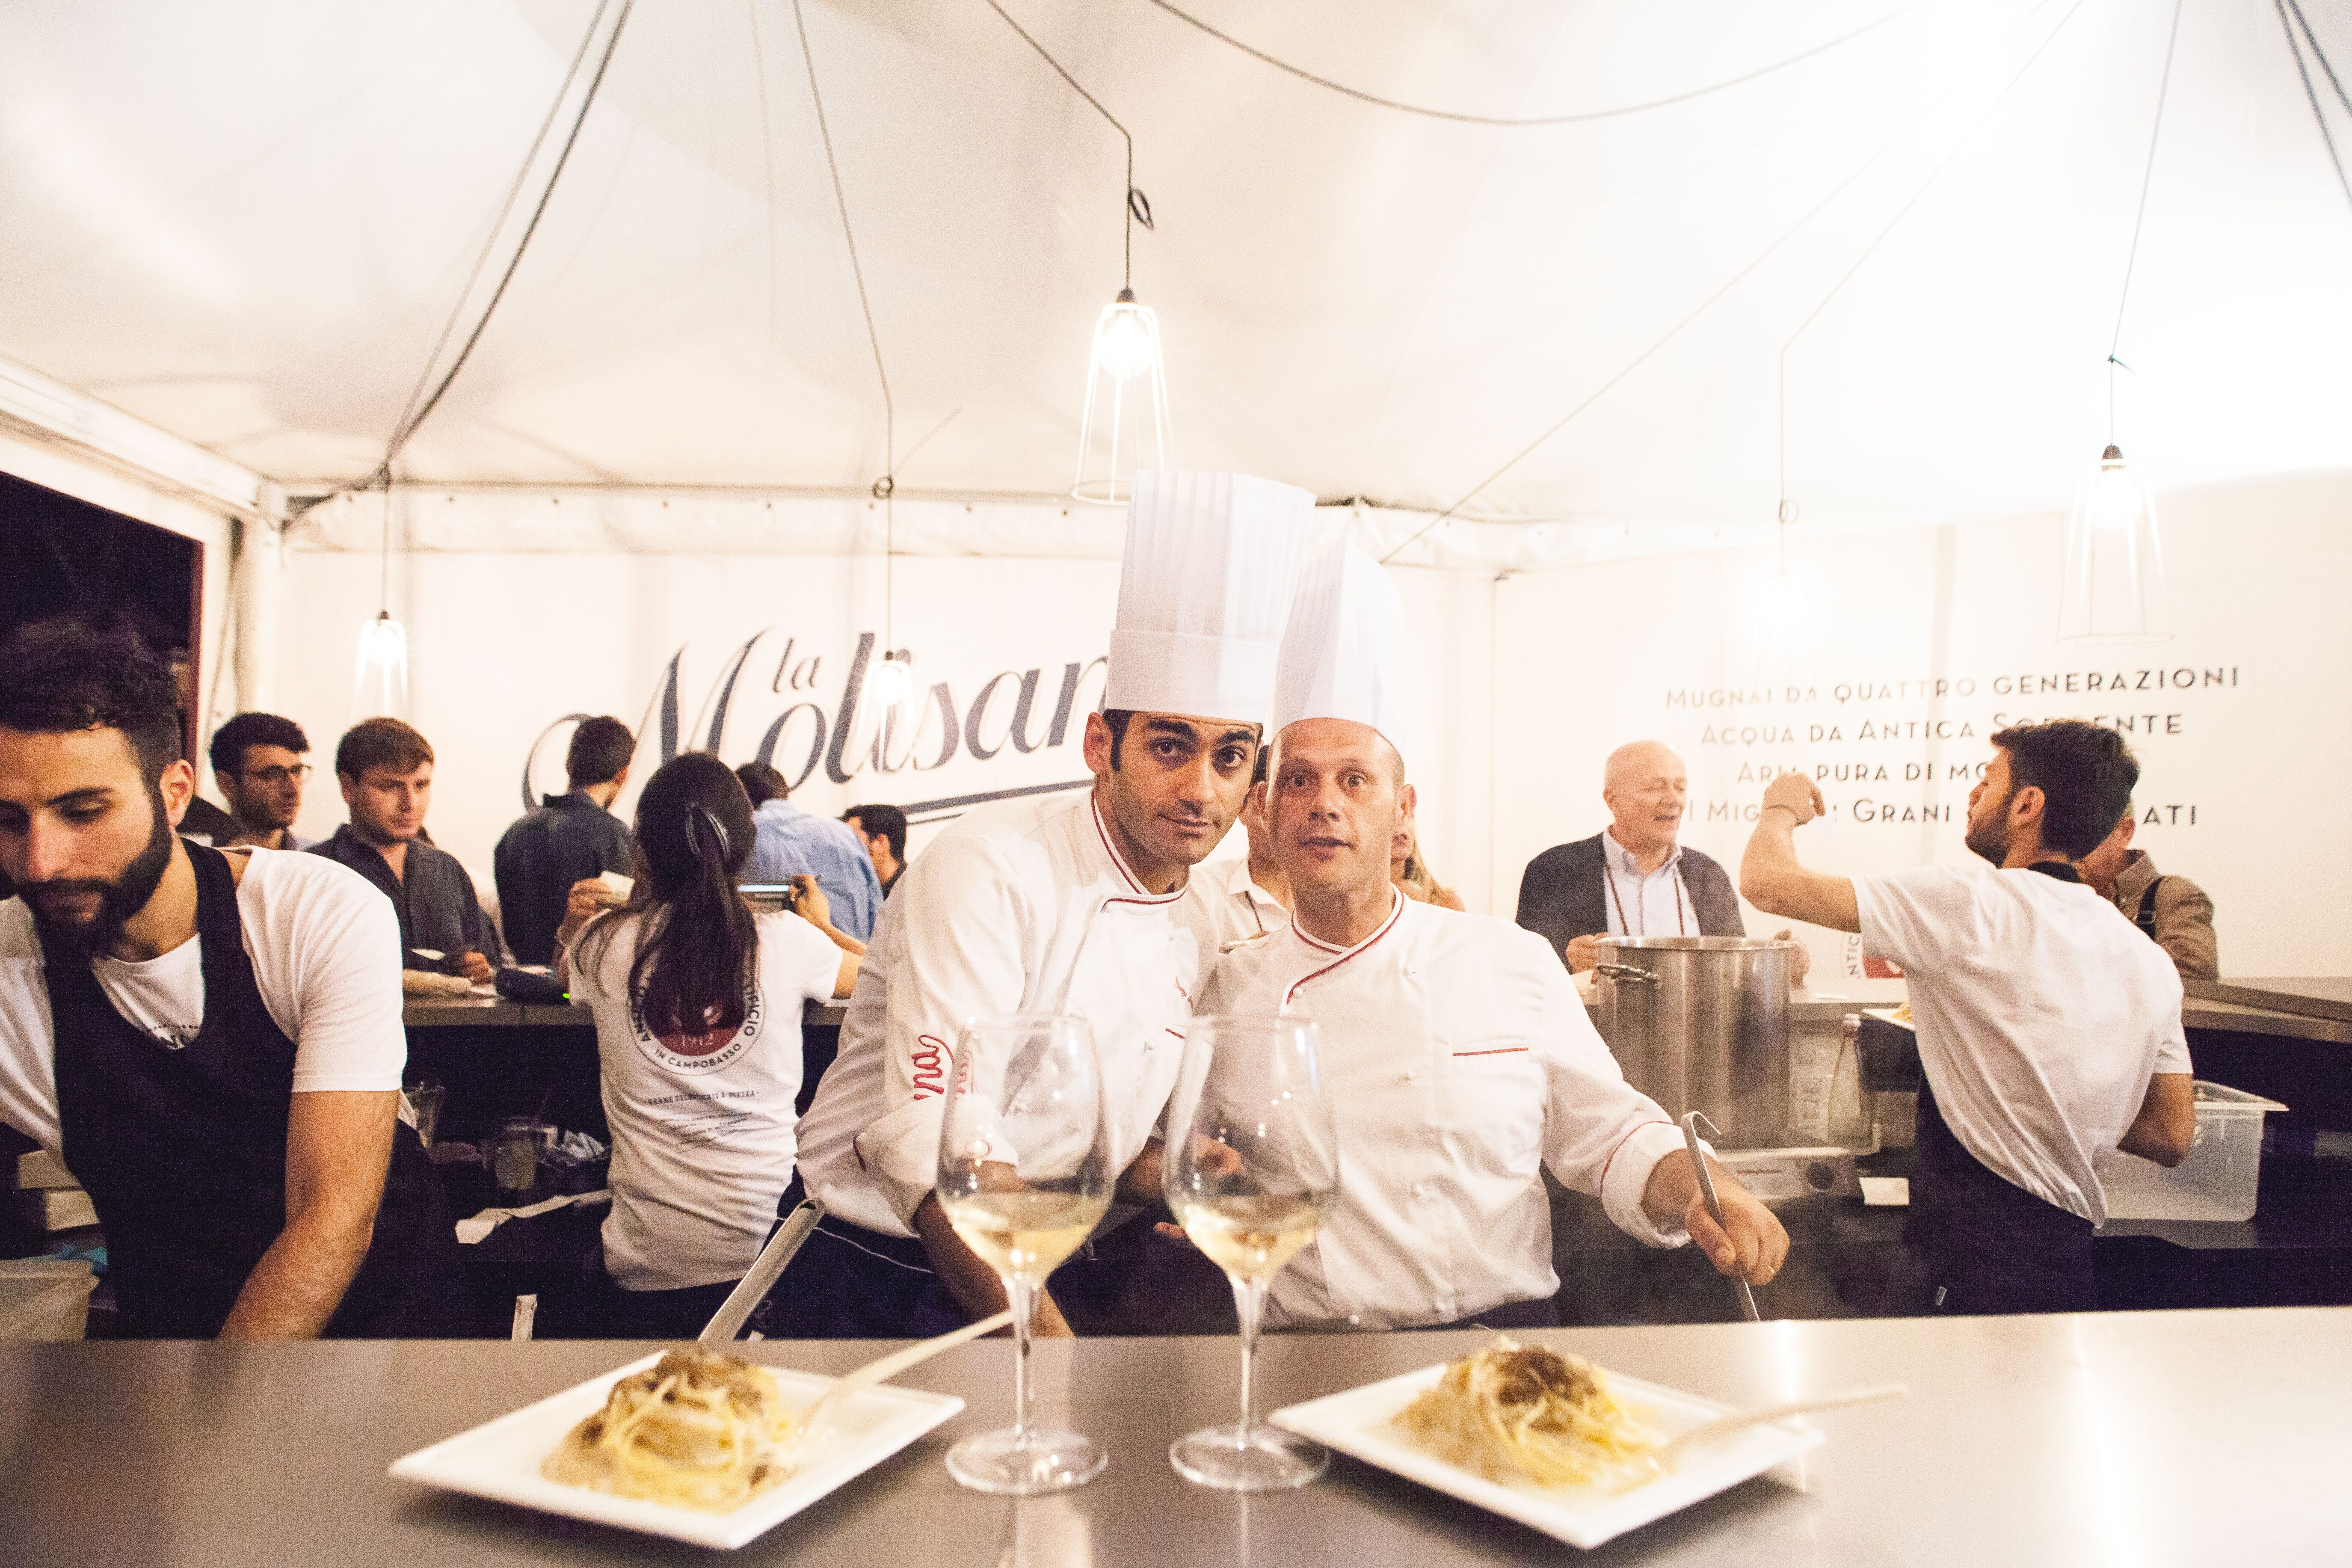 Giuseppe Angino e Francesco Morra. Credits: Giacomo Latorrata